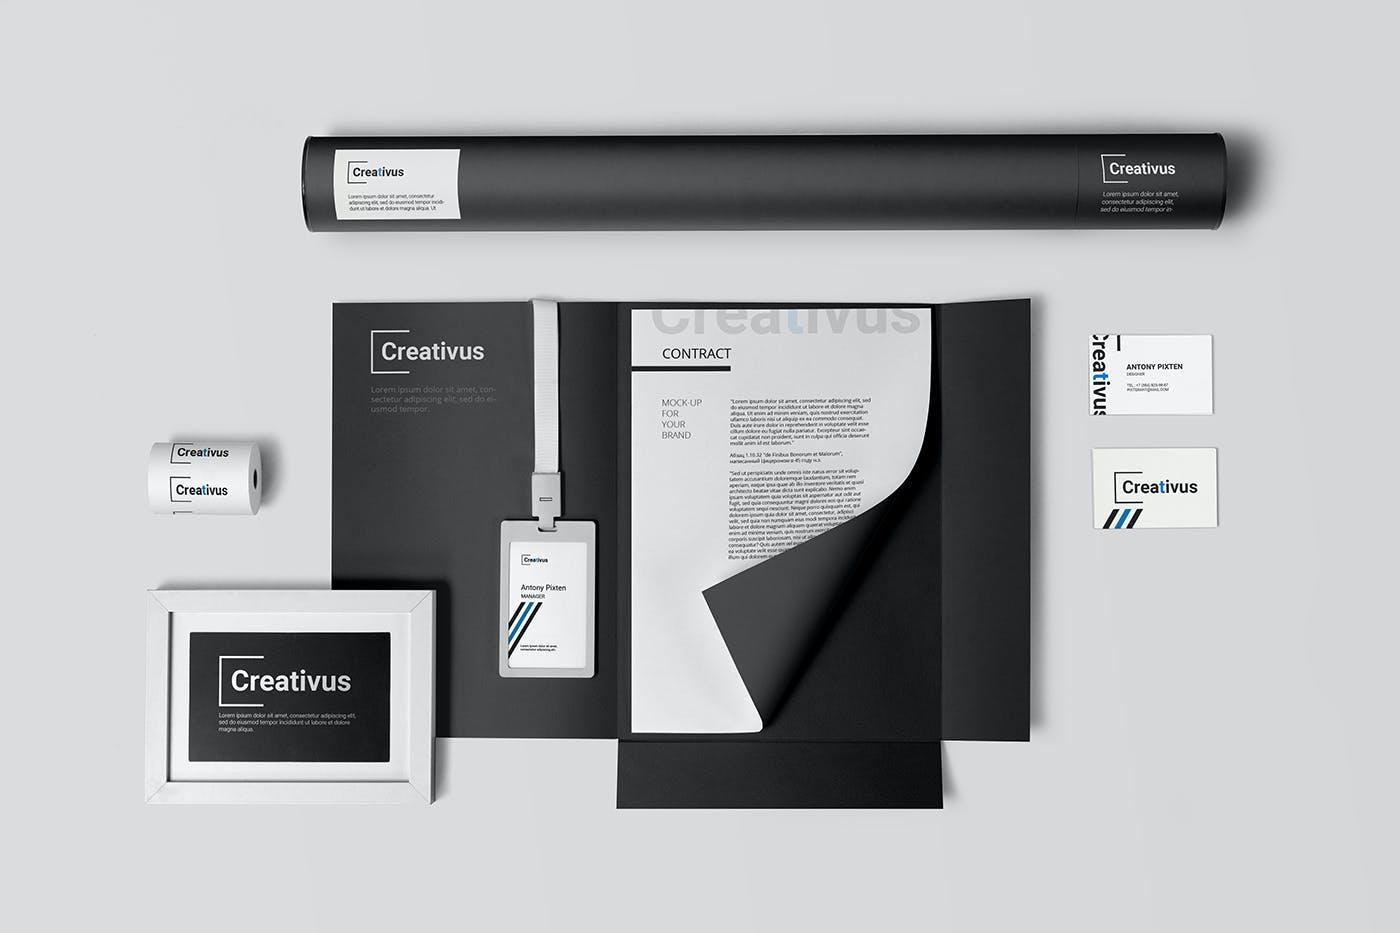 7款品牌LOGO设计办公用品展示贴图样机 Branding Stationery Mockup插图(4)